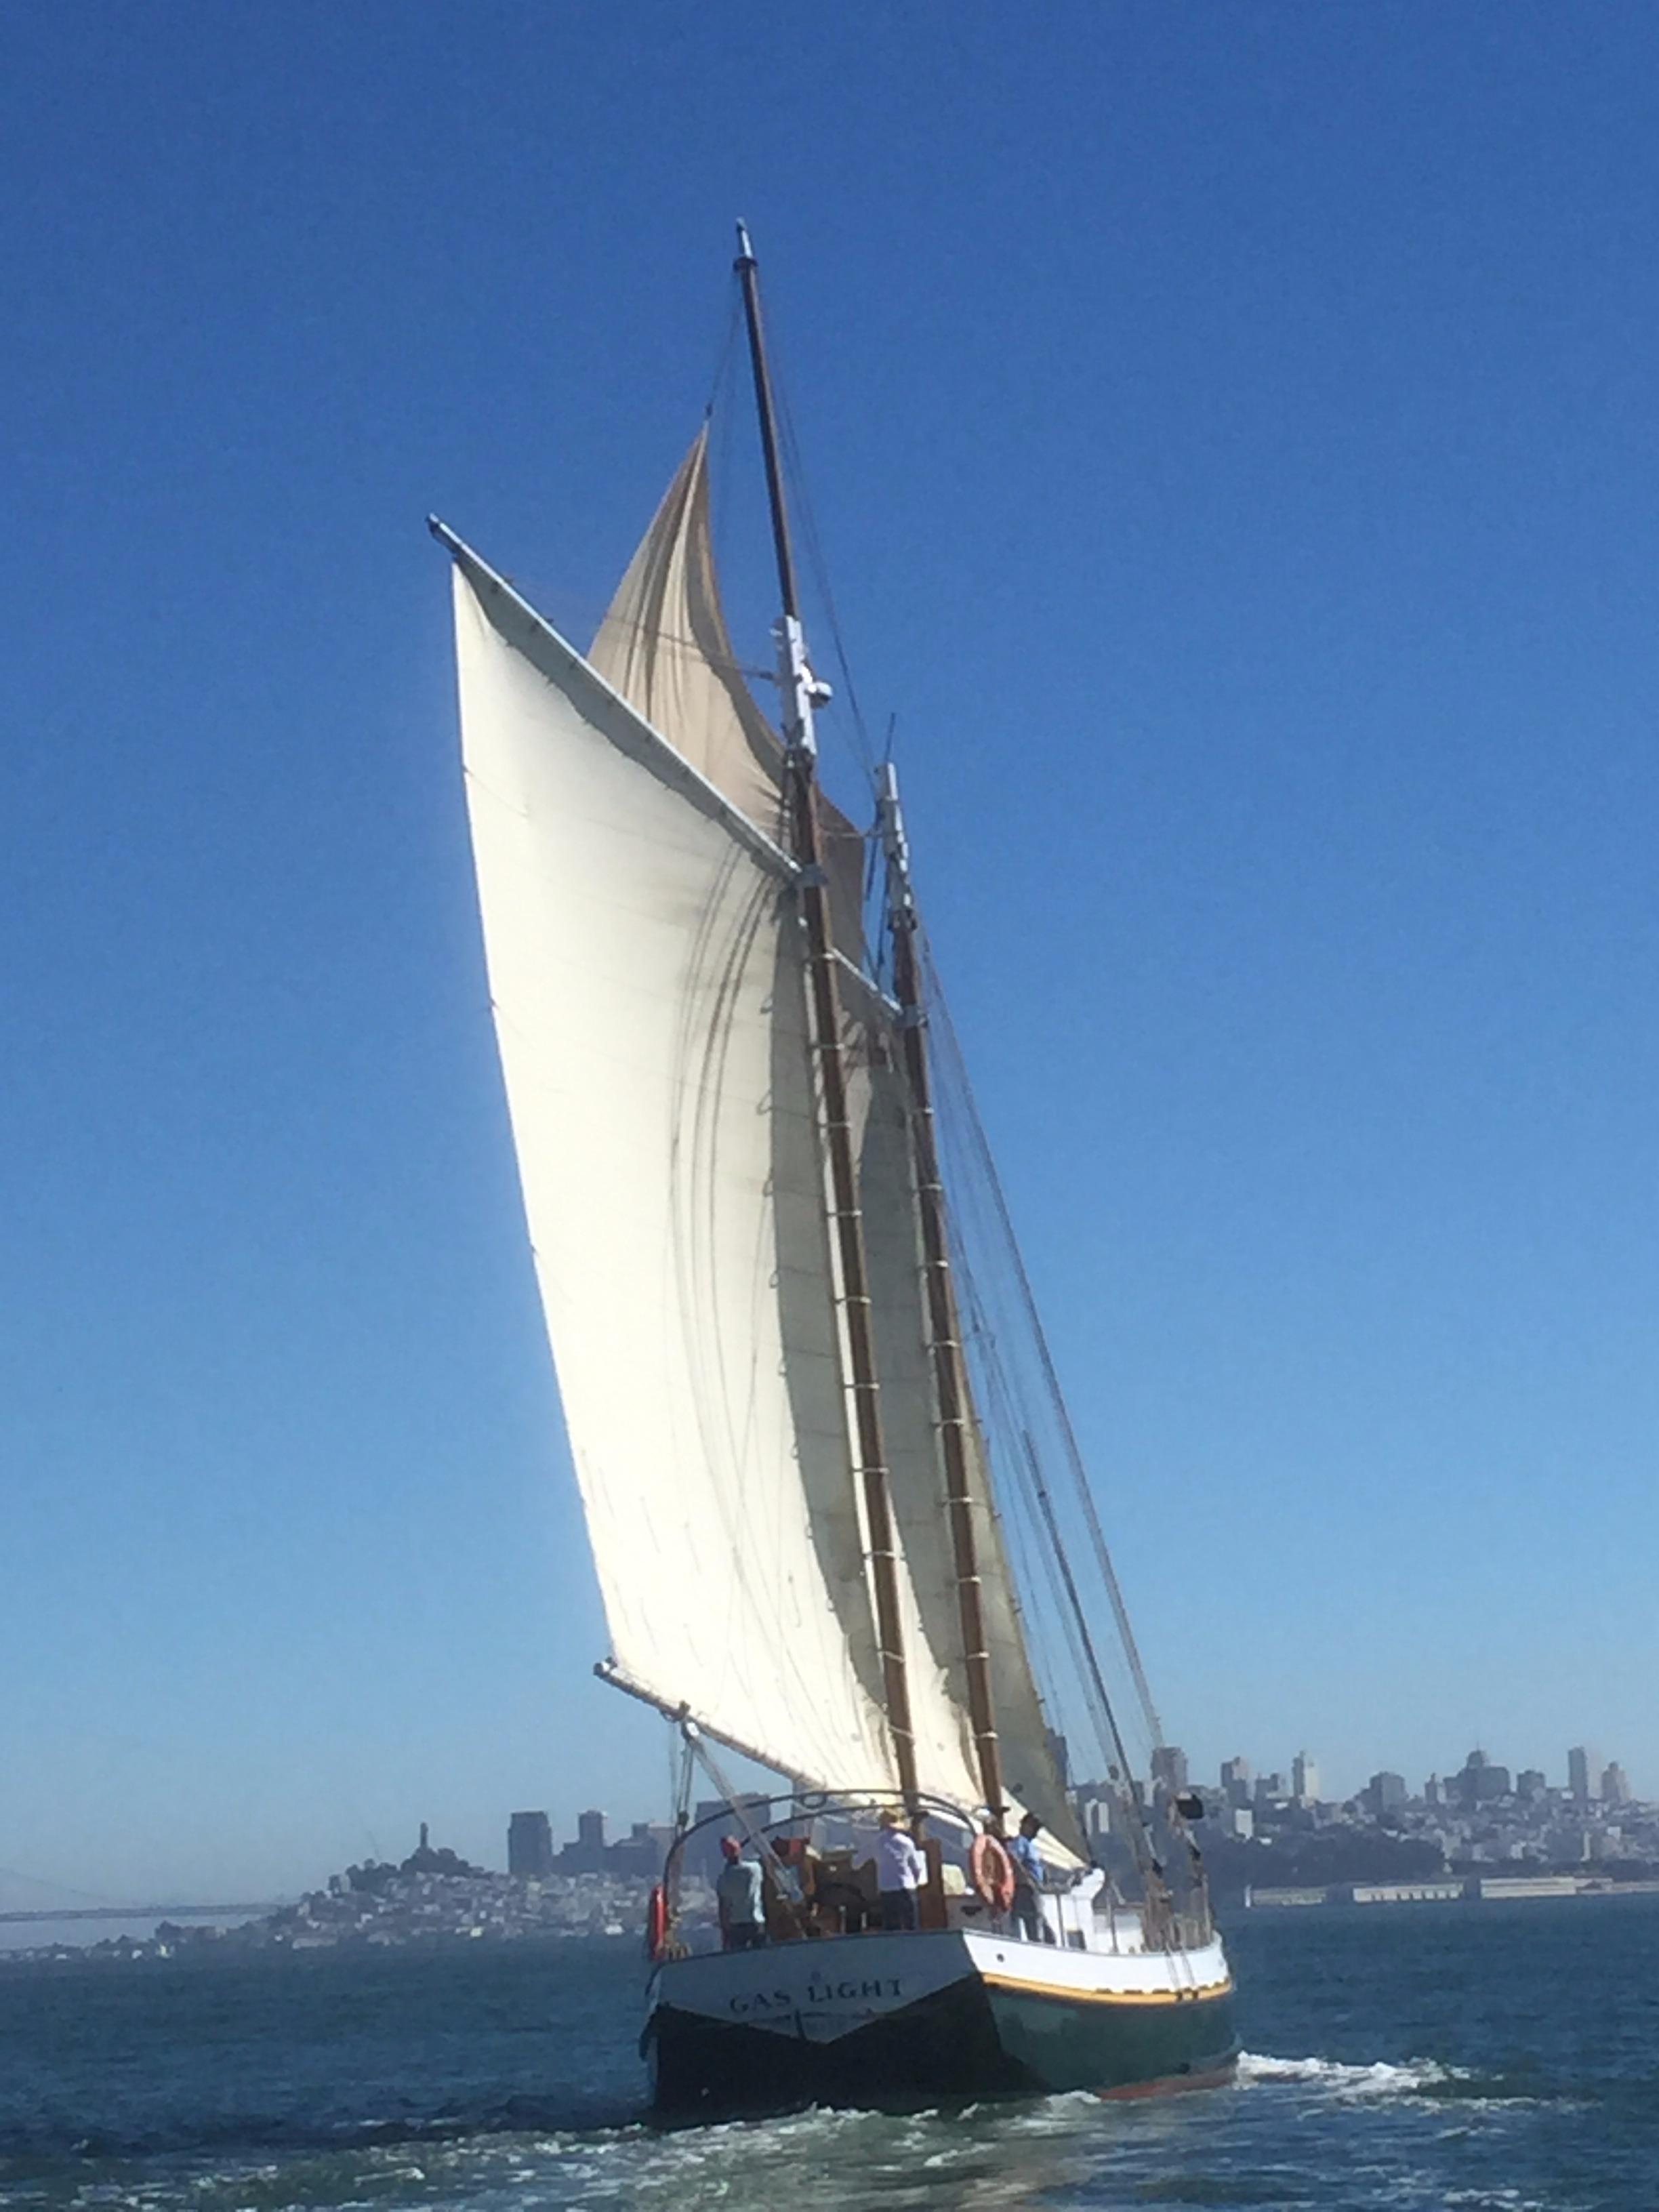 72' Custom Scow Schooner Yacht For Sale - Rubicon Yachts